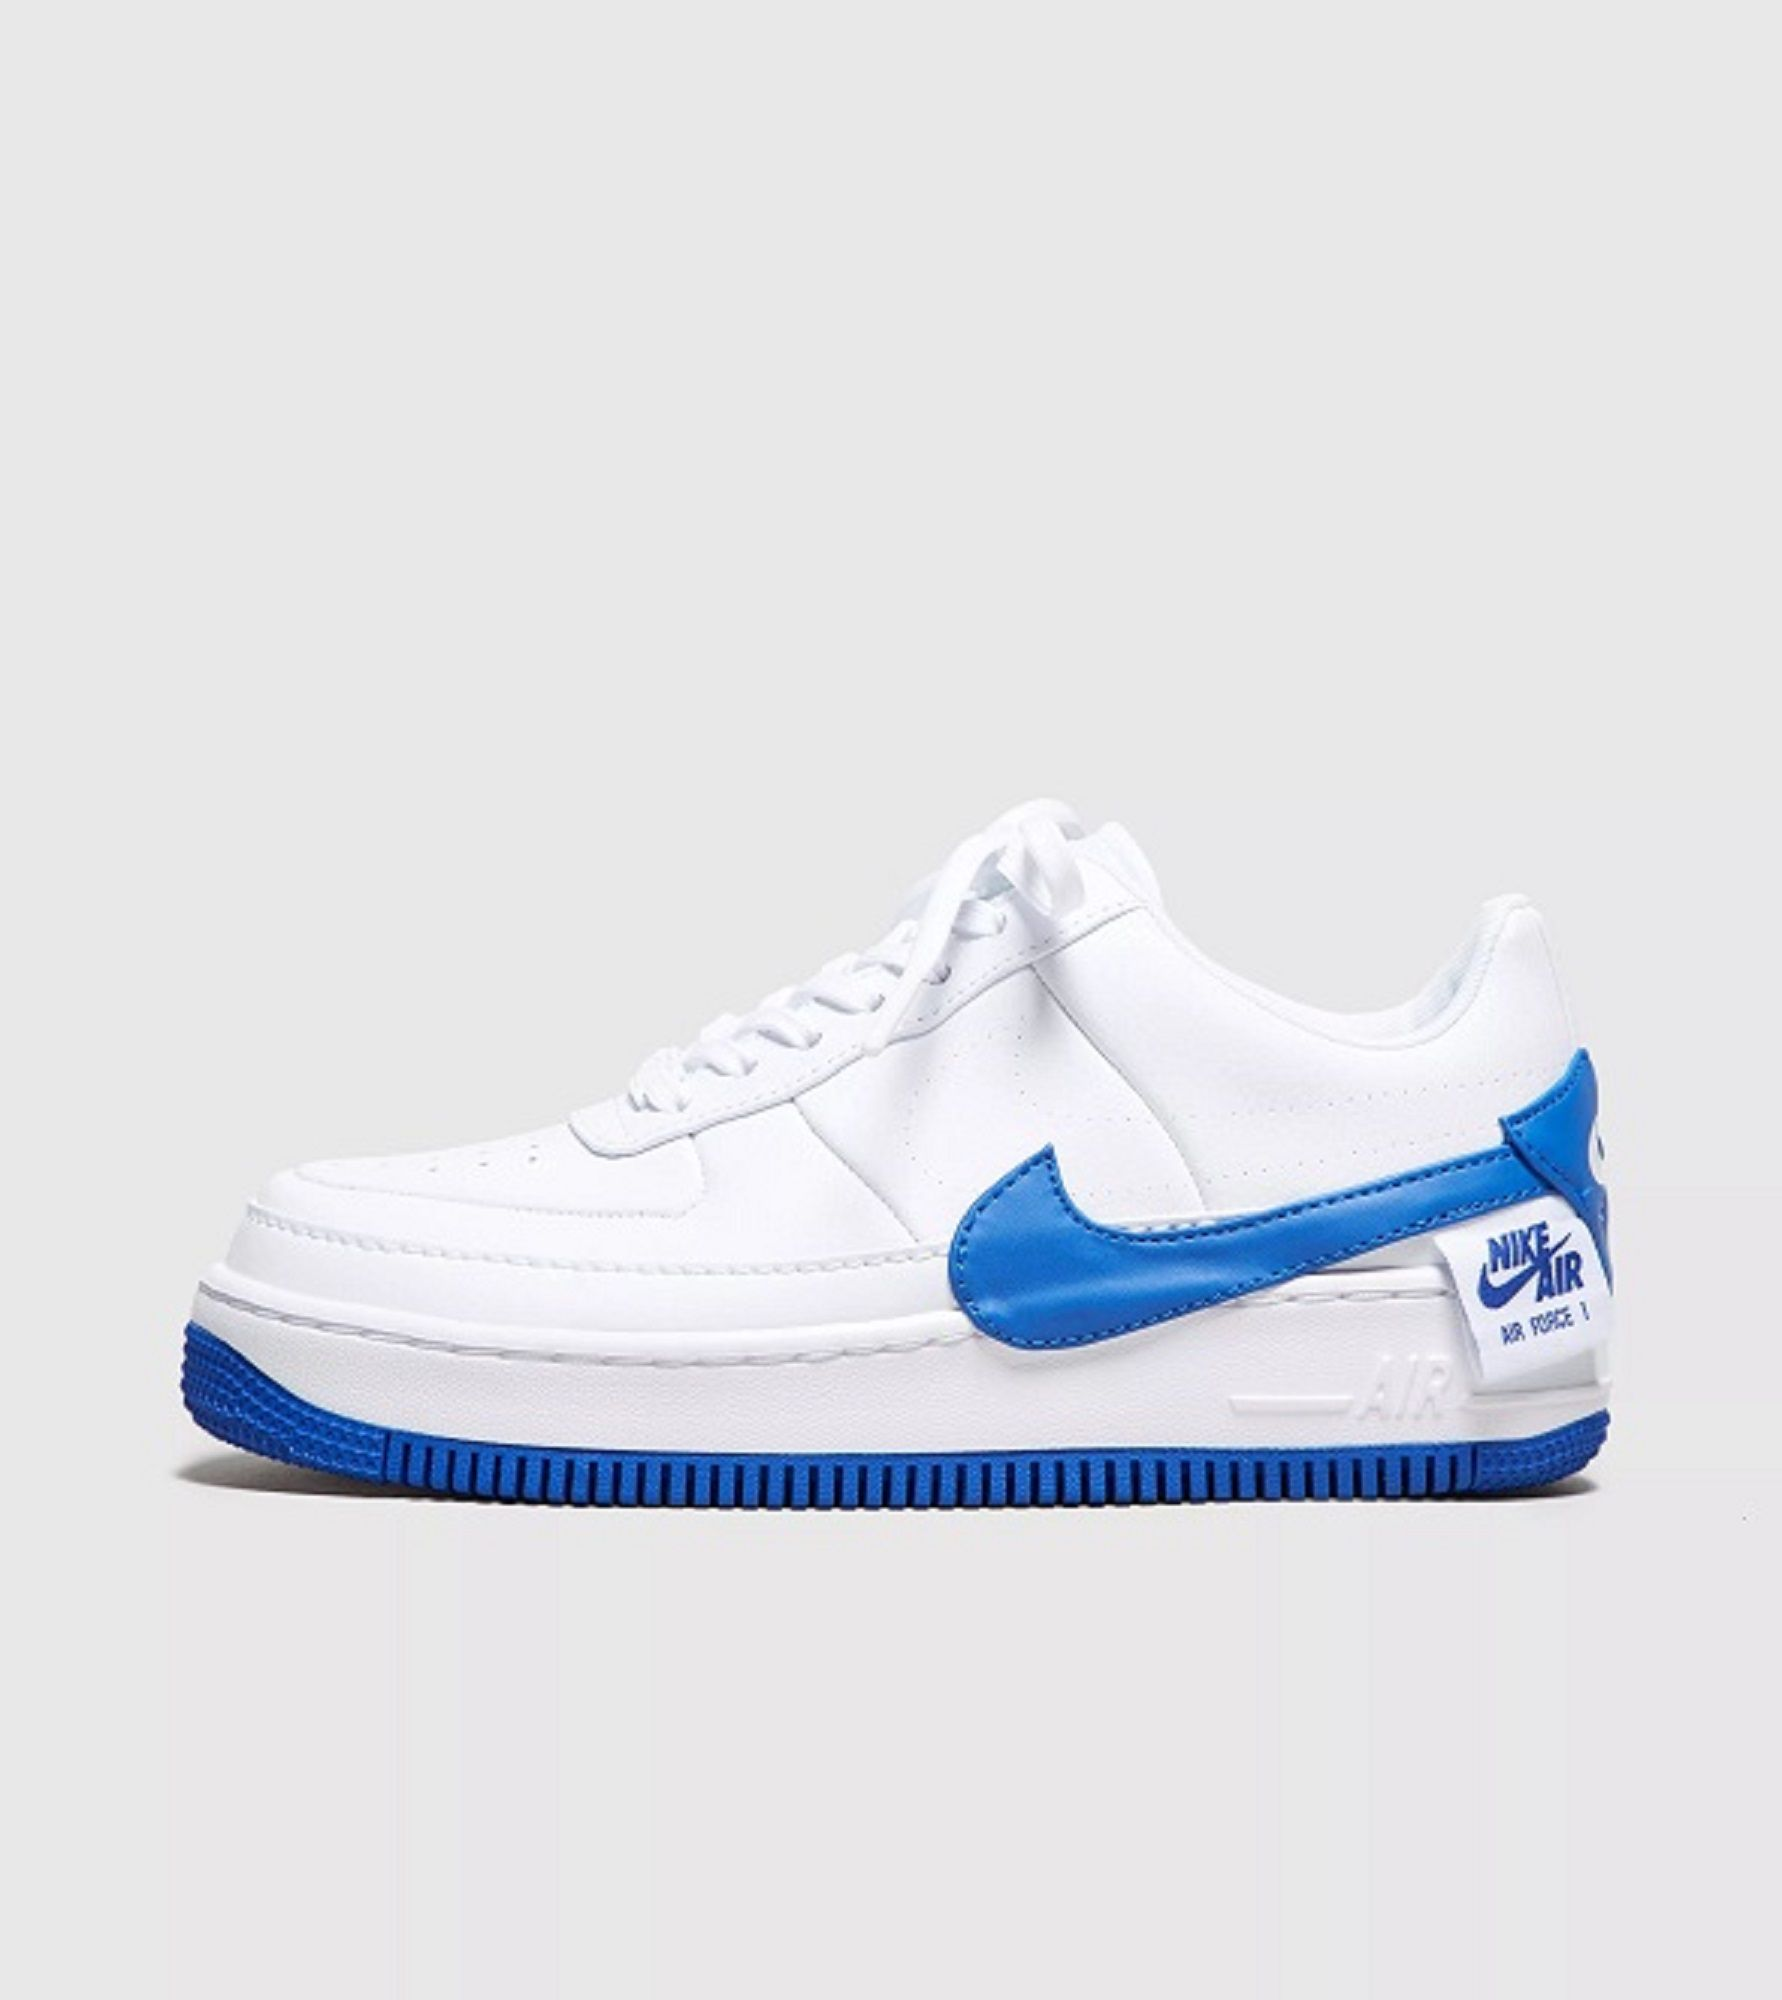 air force 1 blu donna